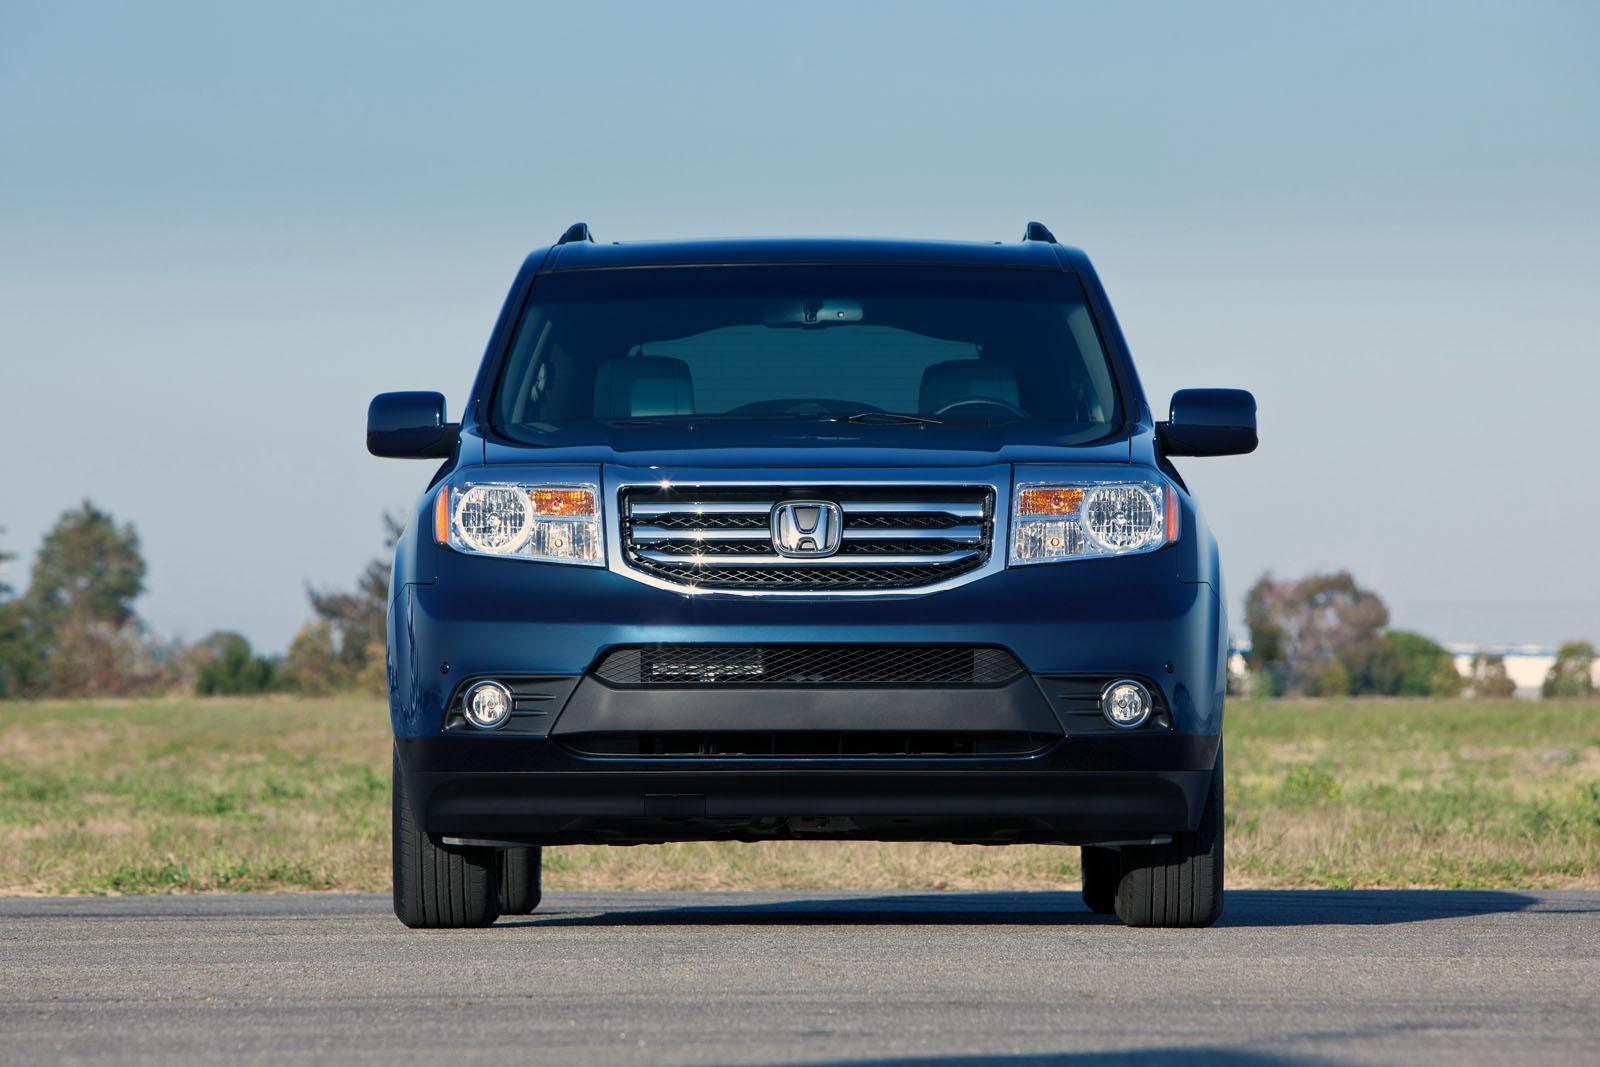 2012 Honda Pilot Price - $28 470